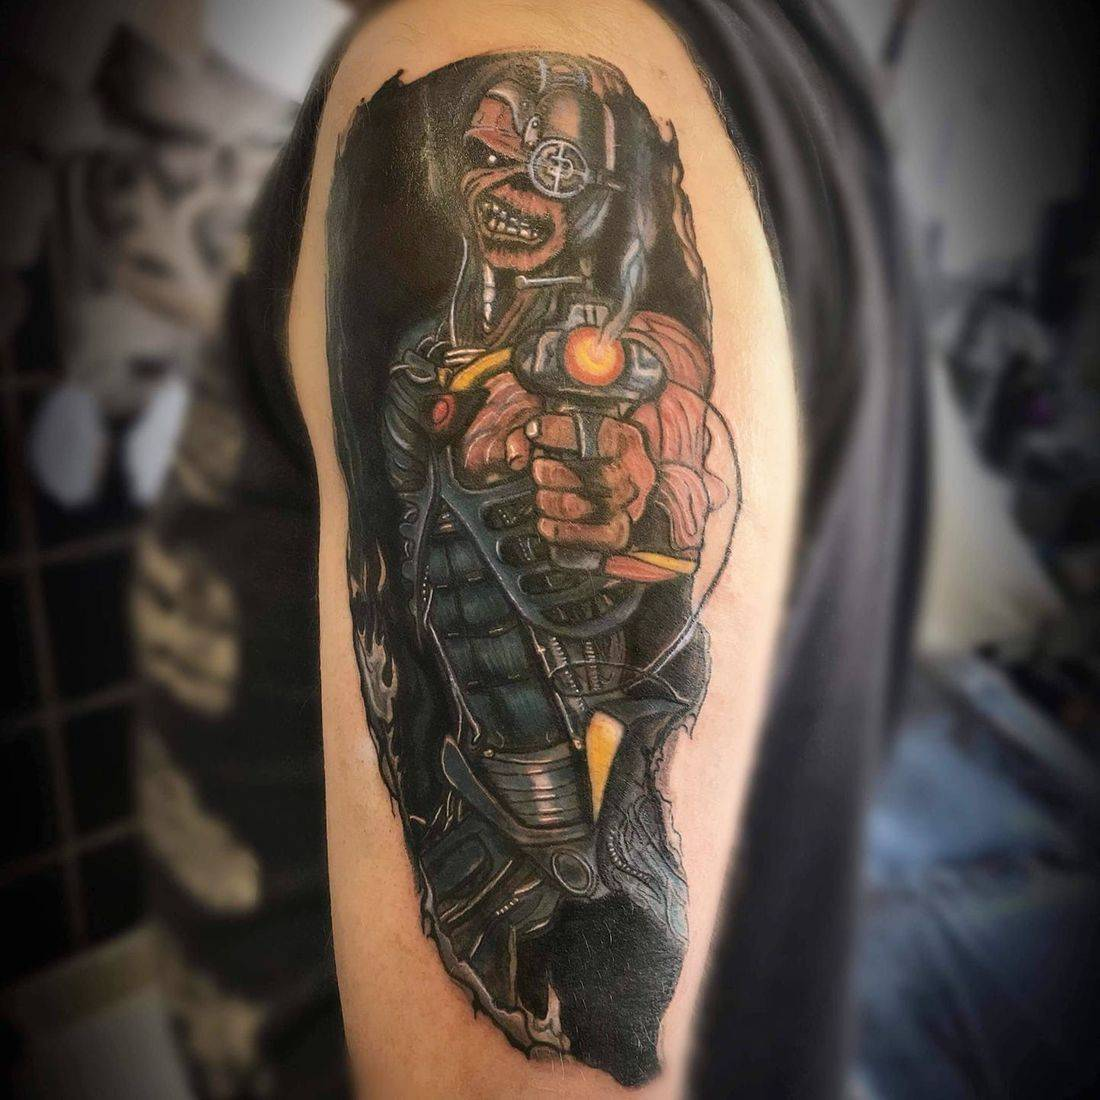 smokin ink tattoo studio Bristol